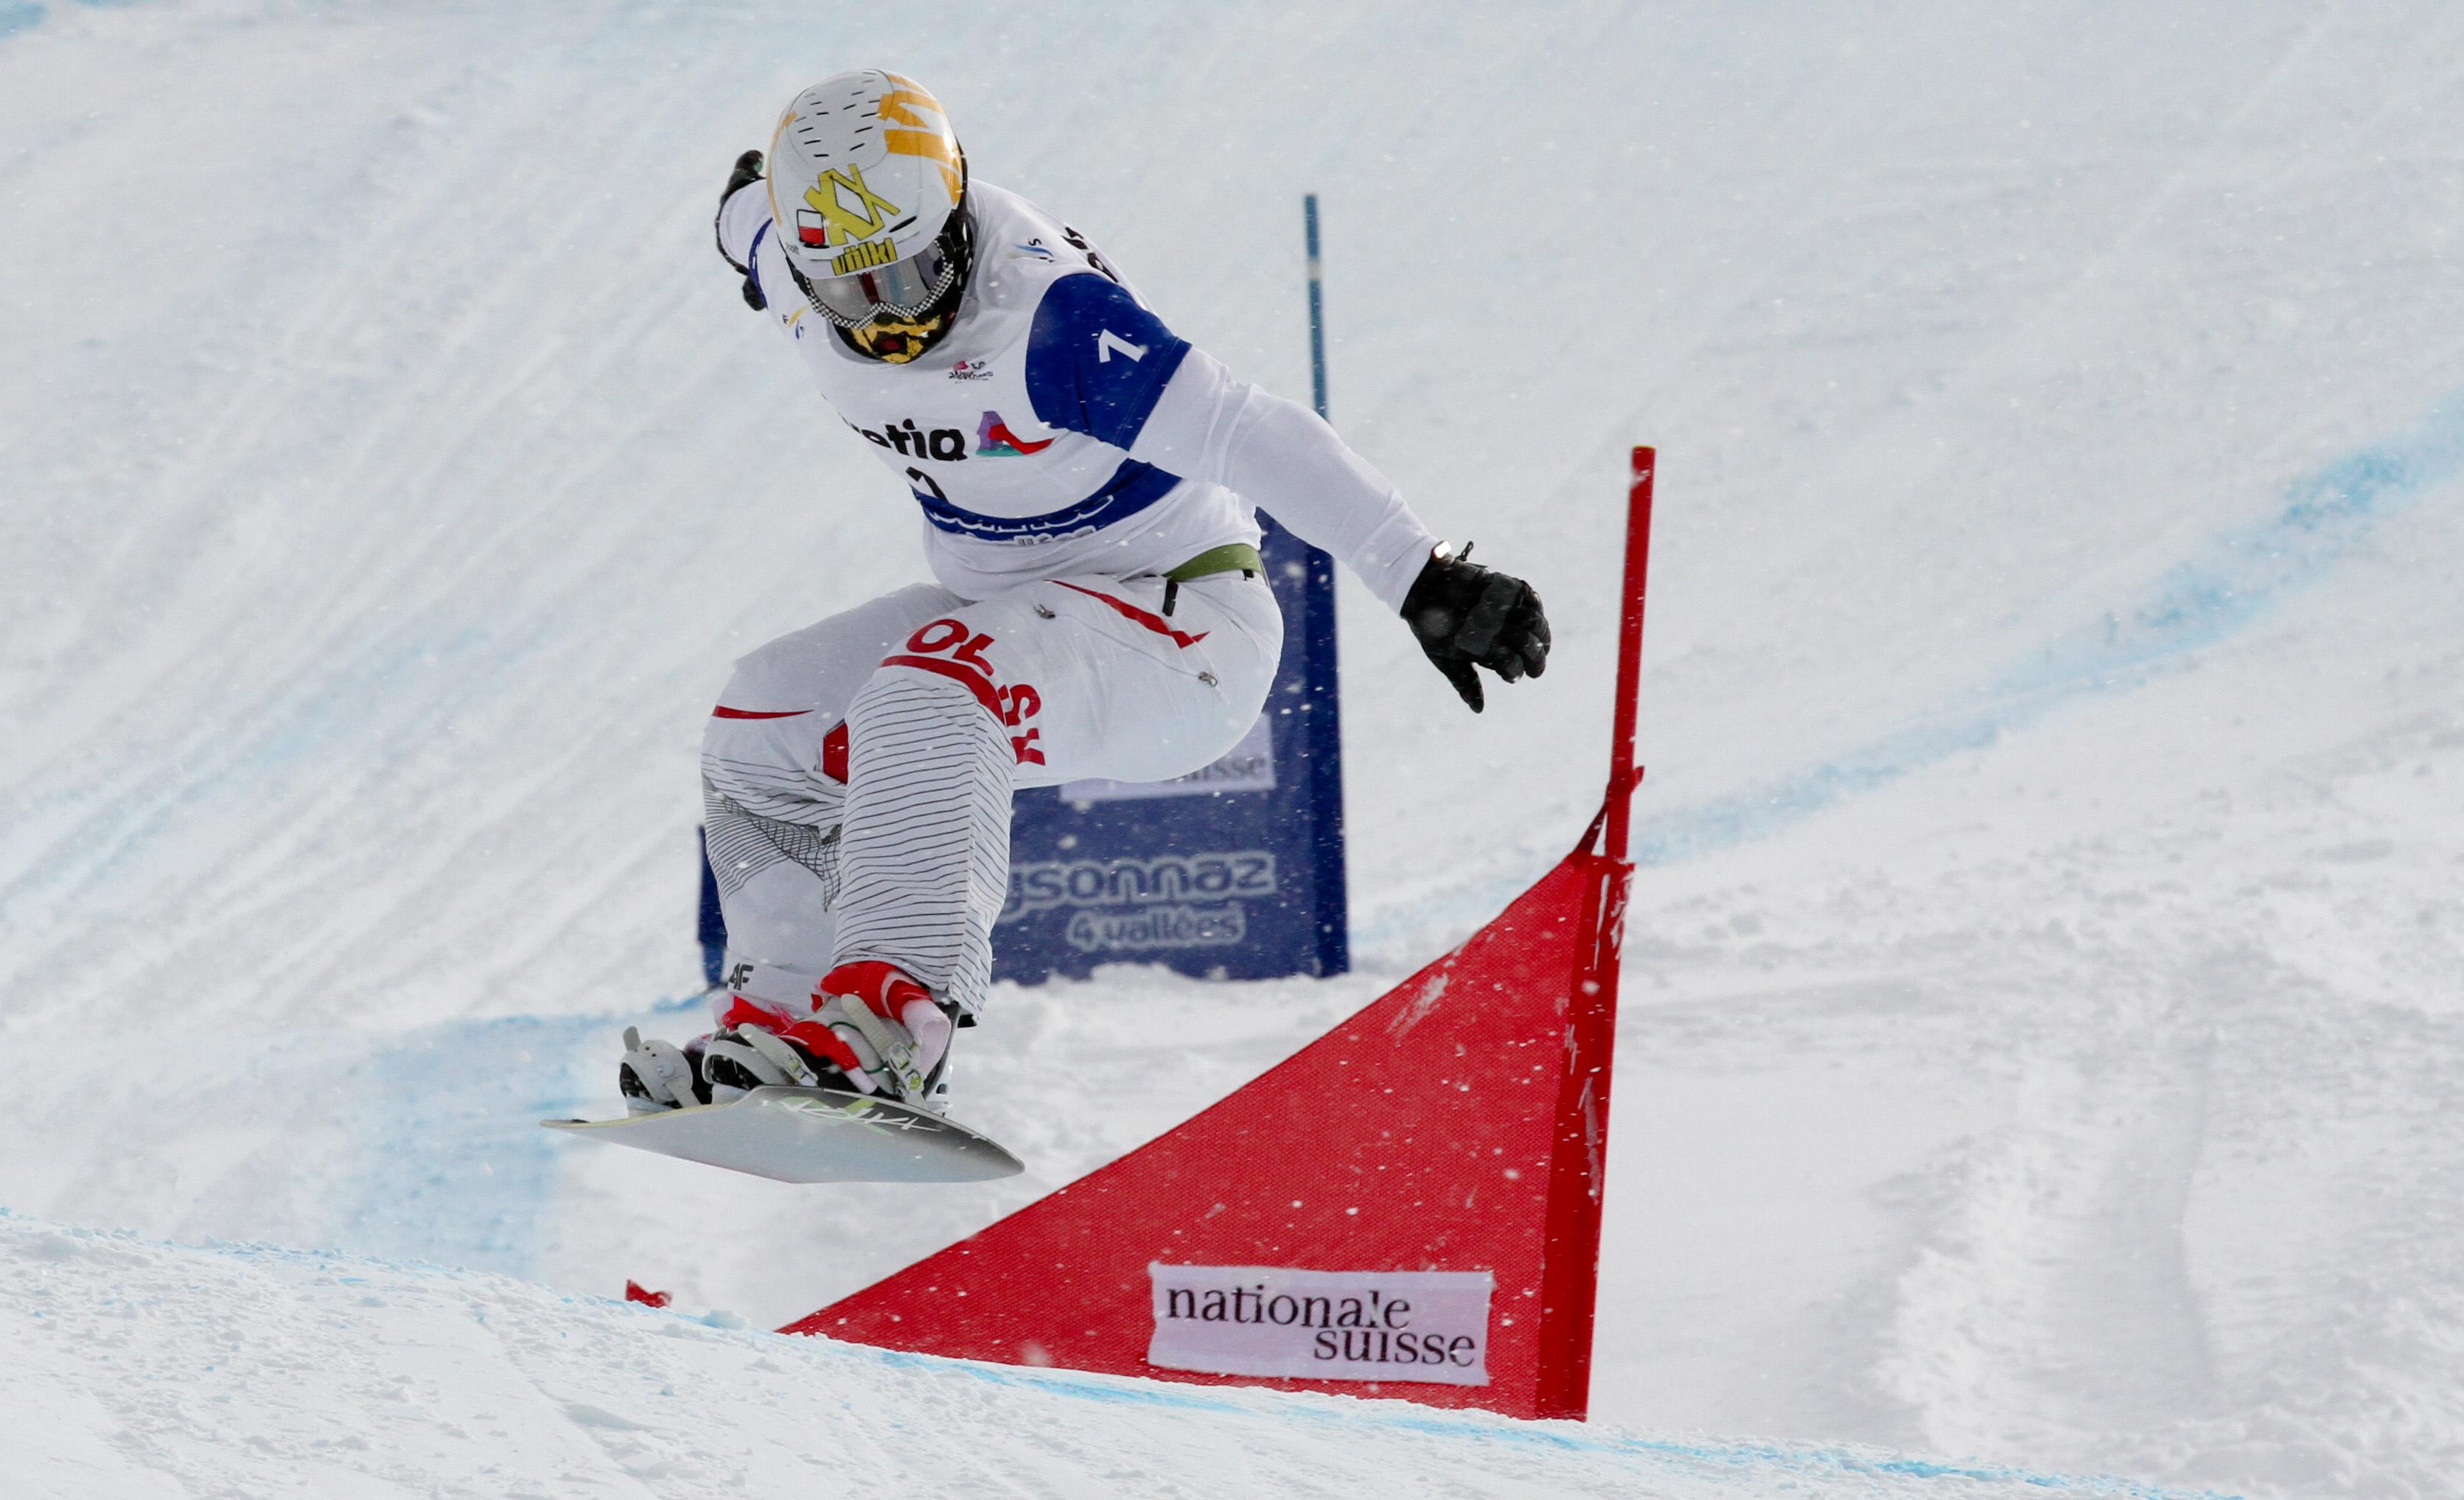 SBX World Cup Veysonnaz - Qualifiers SBX 2 - Mateusz Ligocki (POL)